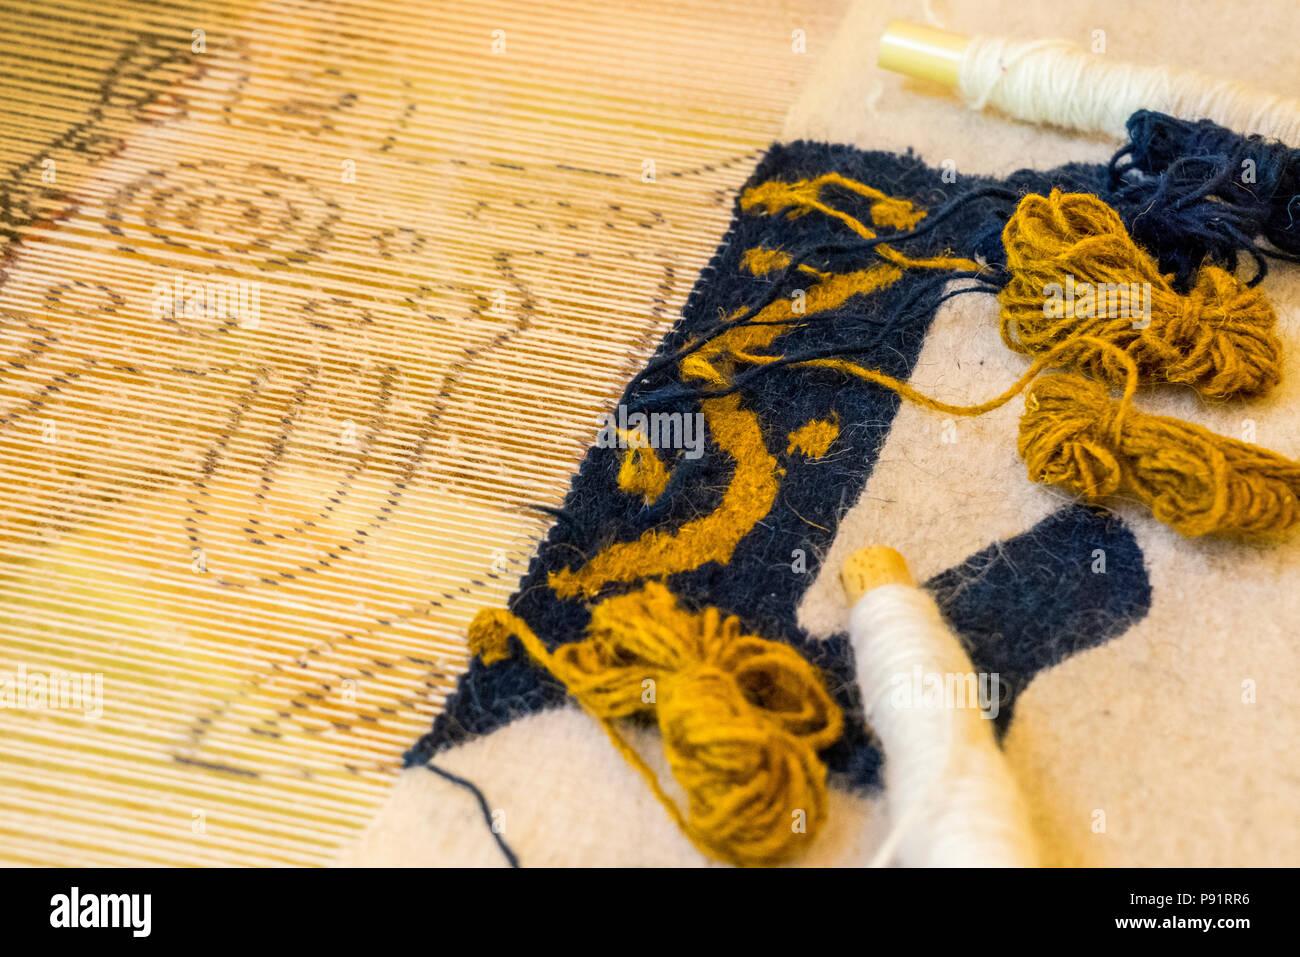 Rug Weaving Stock Photos Amp Rug Weaving Stock Images Alamy